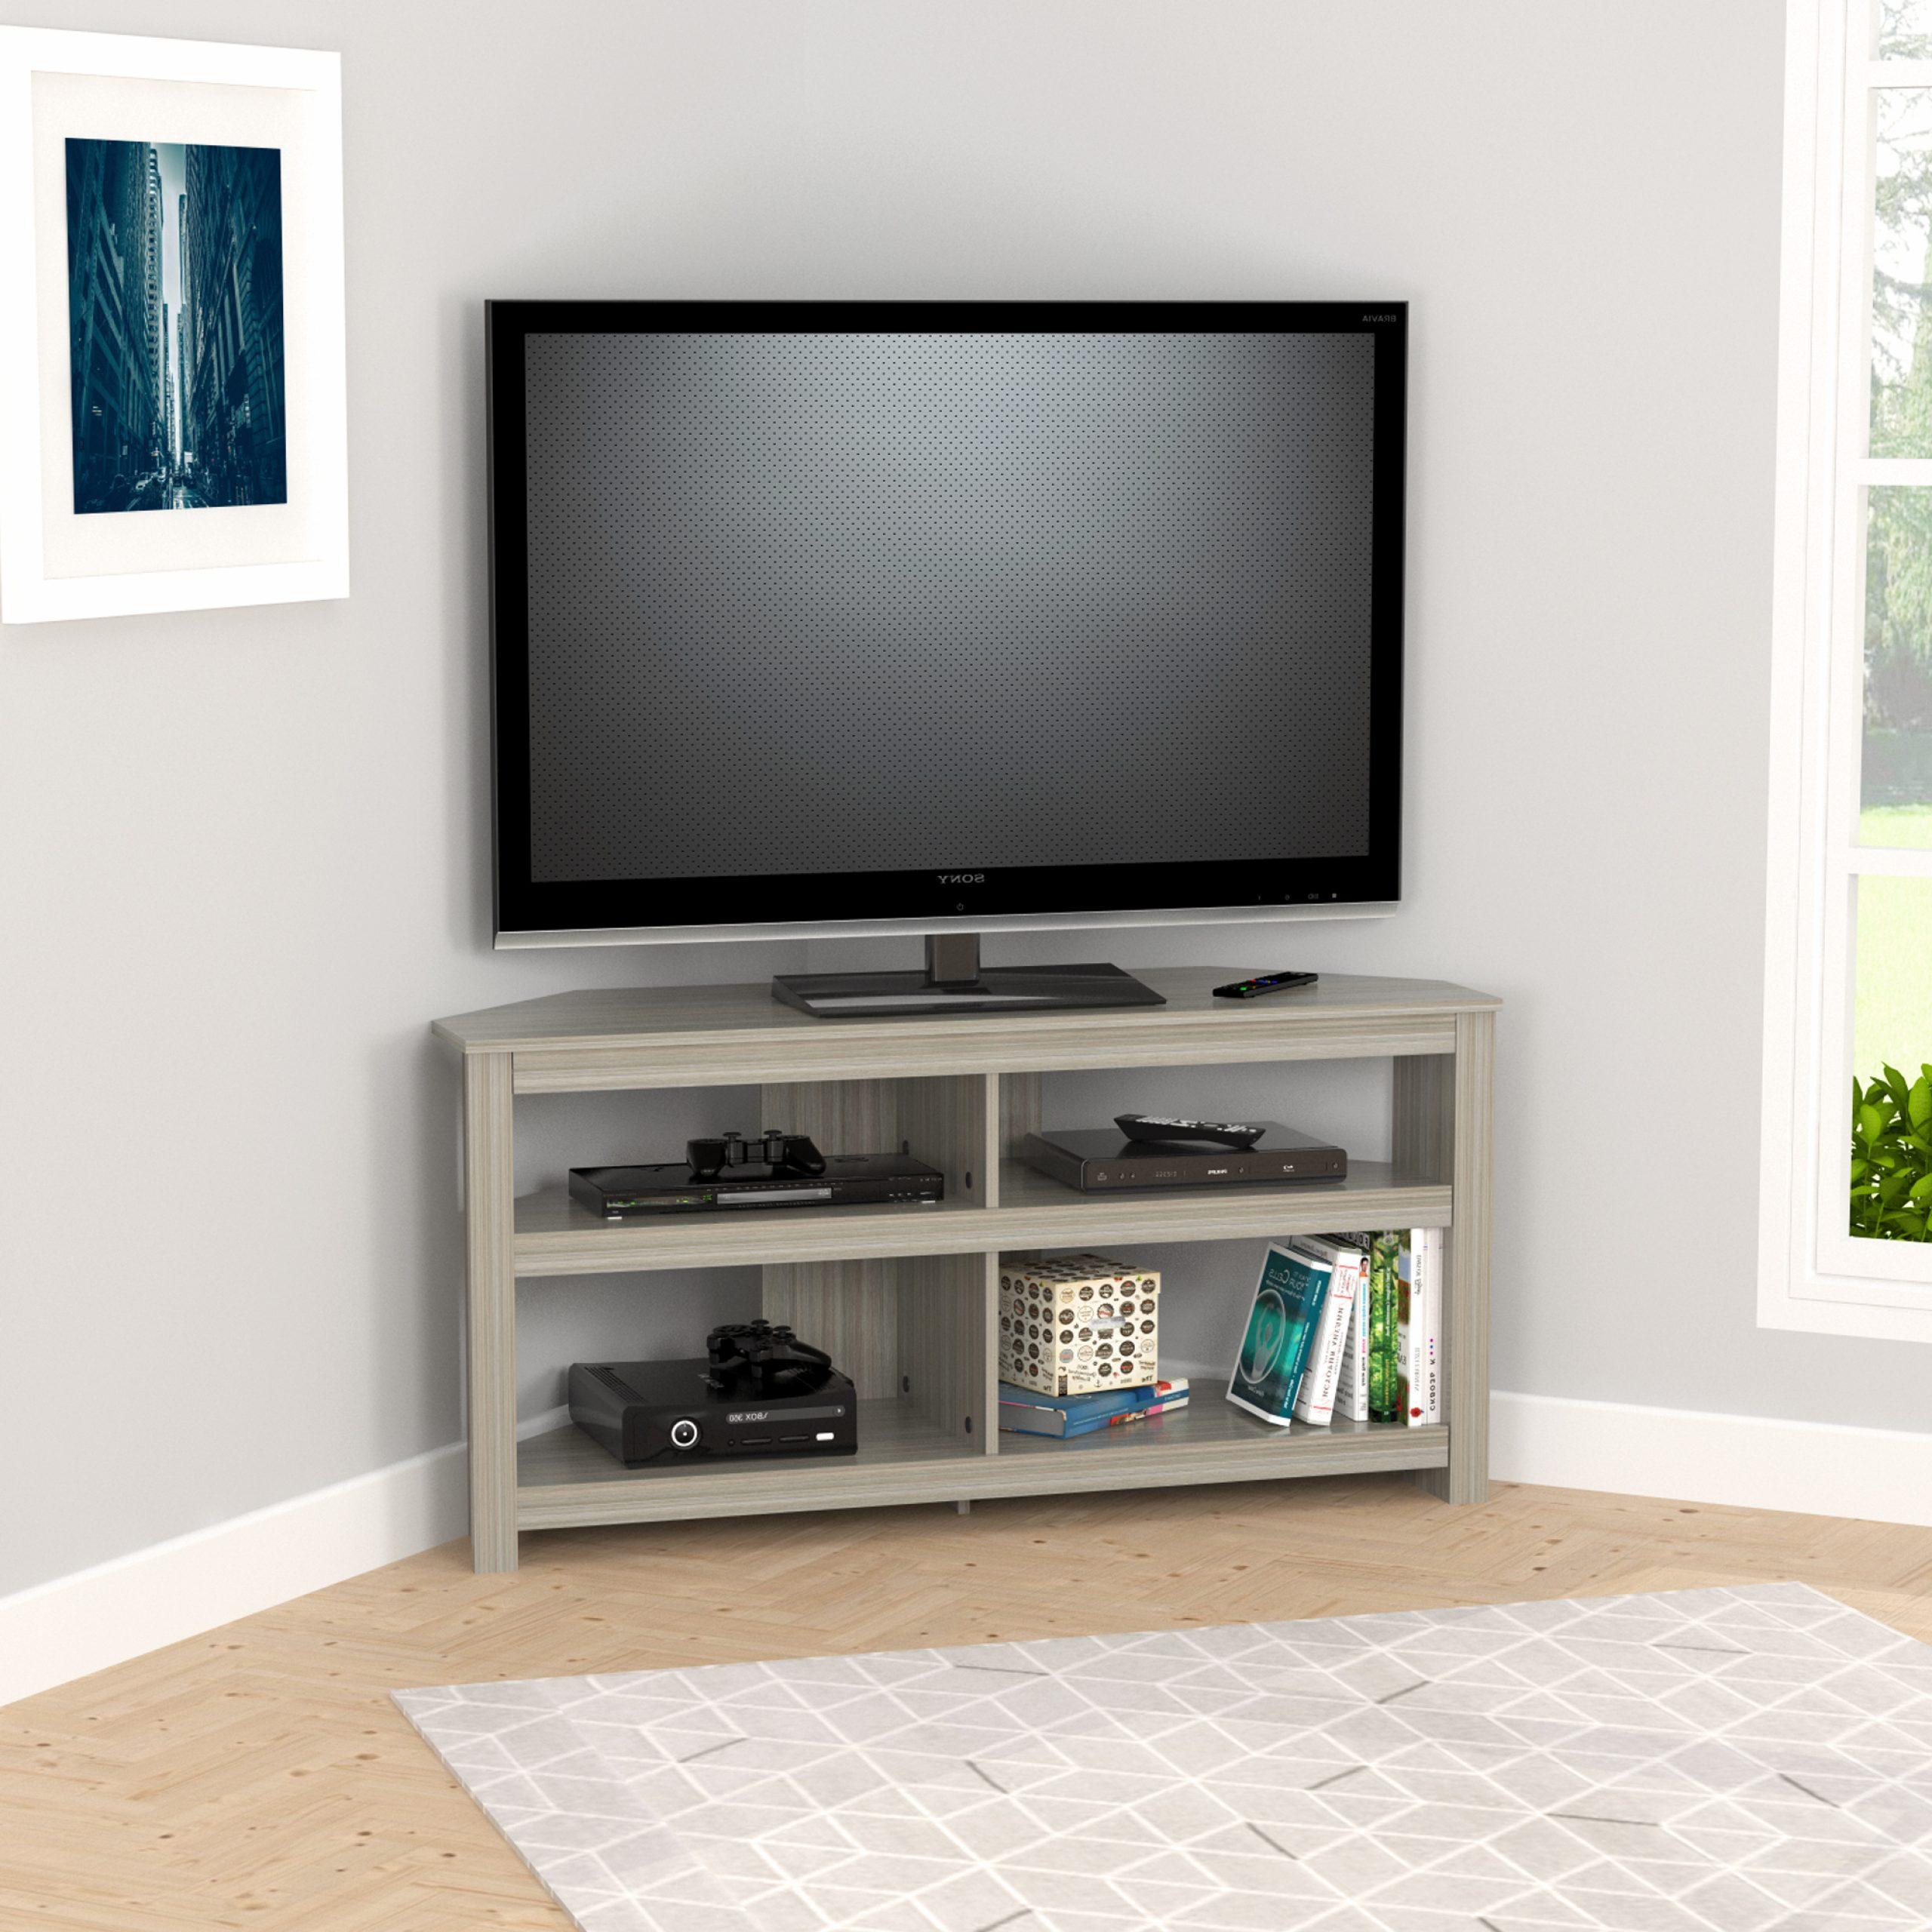 "Inval 4 Shelf Corner Tv Stand For Tvs Up To 60"", Smoke Oak For Corner Tv Stands For Tvs Up To 60"" (View 5 of 20)"